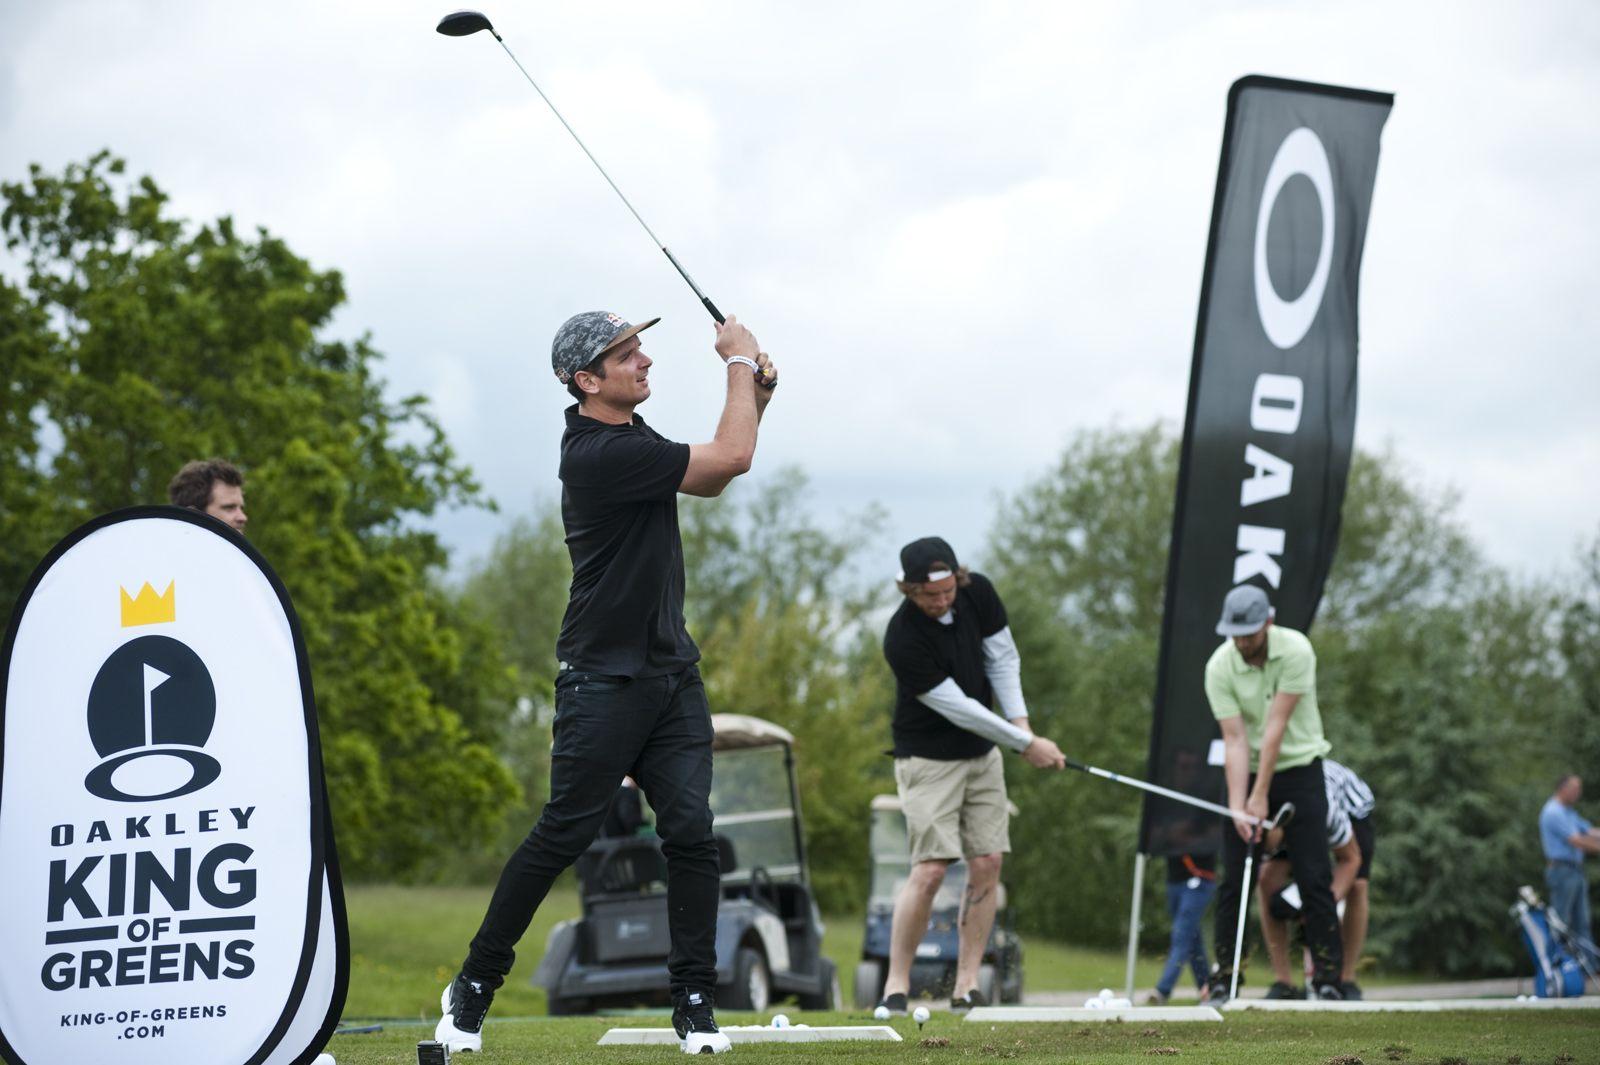 Oakley_King_of Greens_2014_MarkoGrilc_GolfClinic